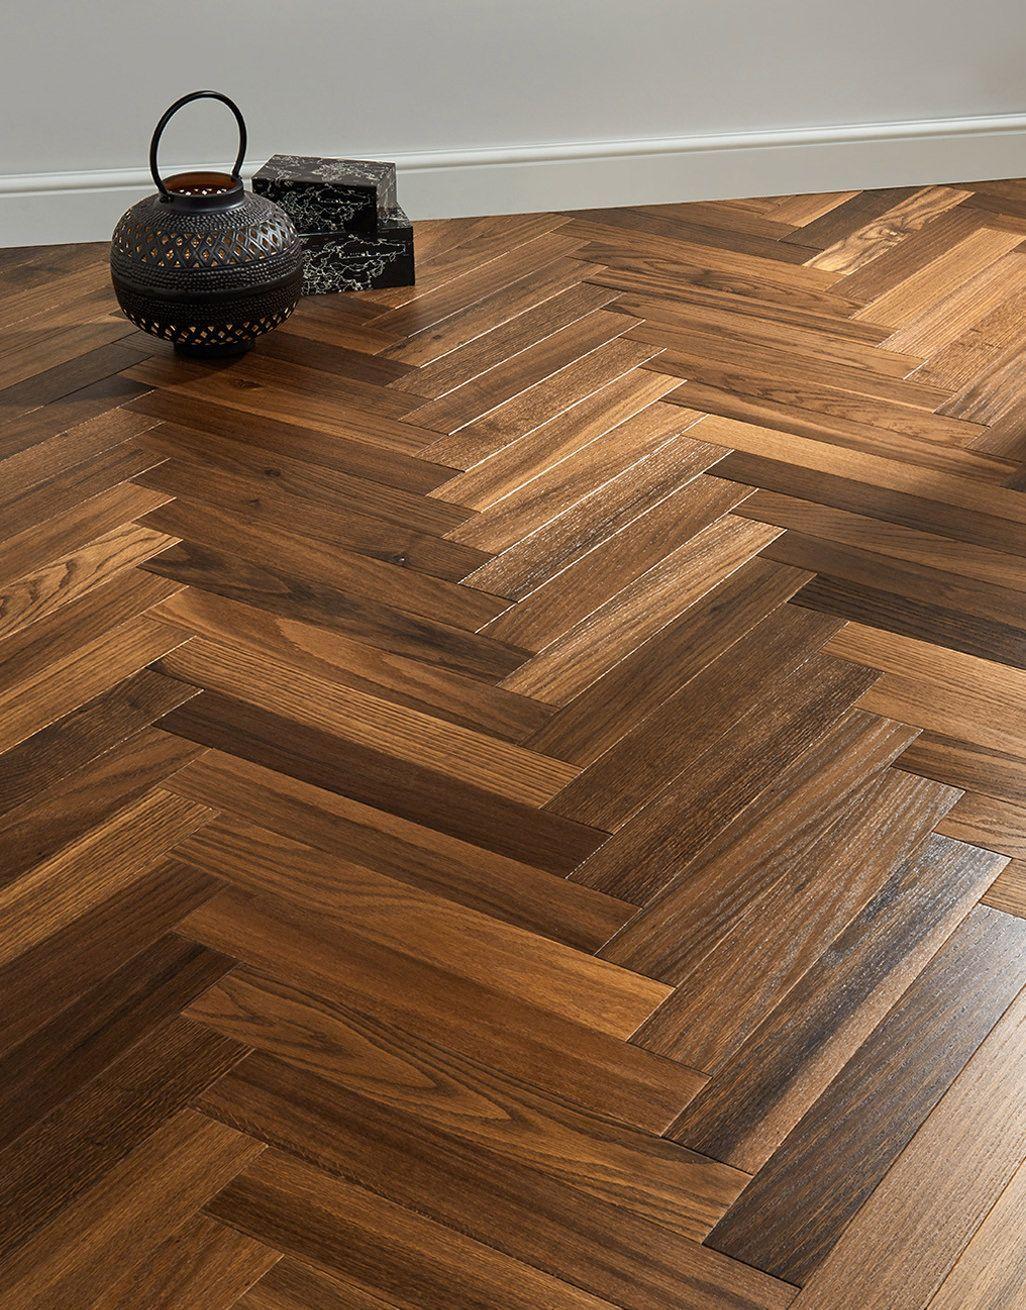 Interiordesignkitchenrustic Interiordesignkitchenmodern Interiordesignkitchencontemporar Wood Floor Design Engineered Wood Floors Engineered Wood Floors Oak